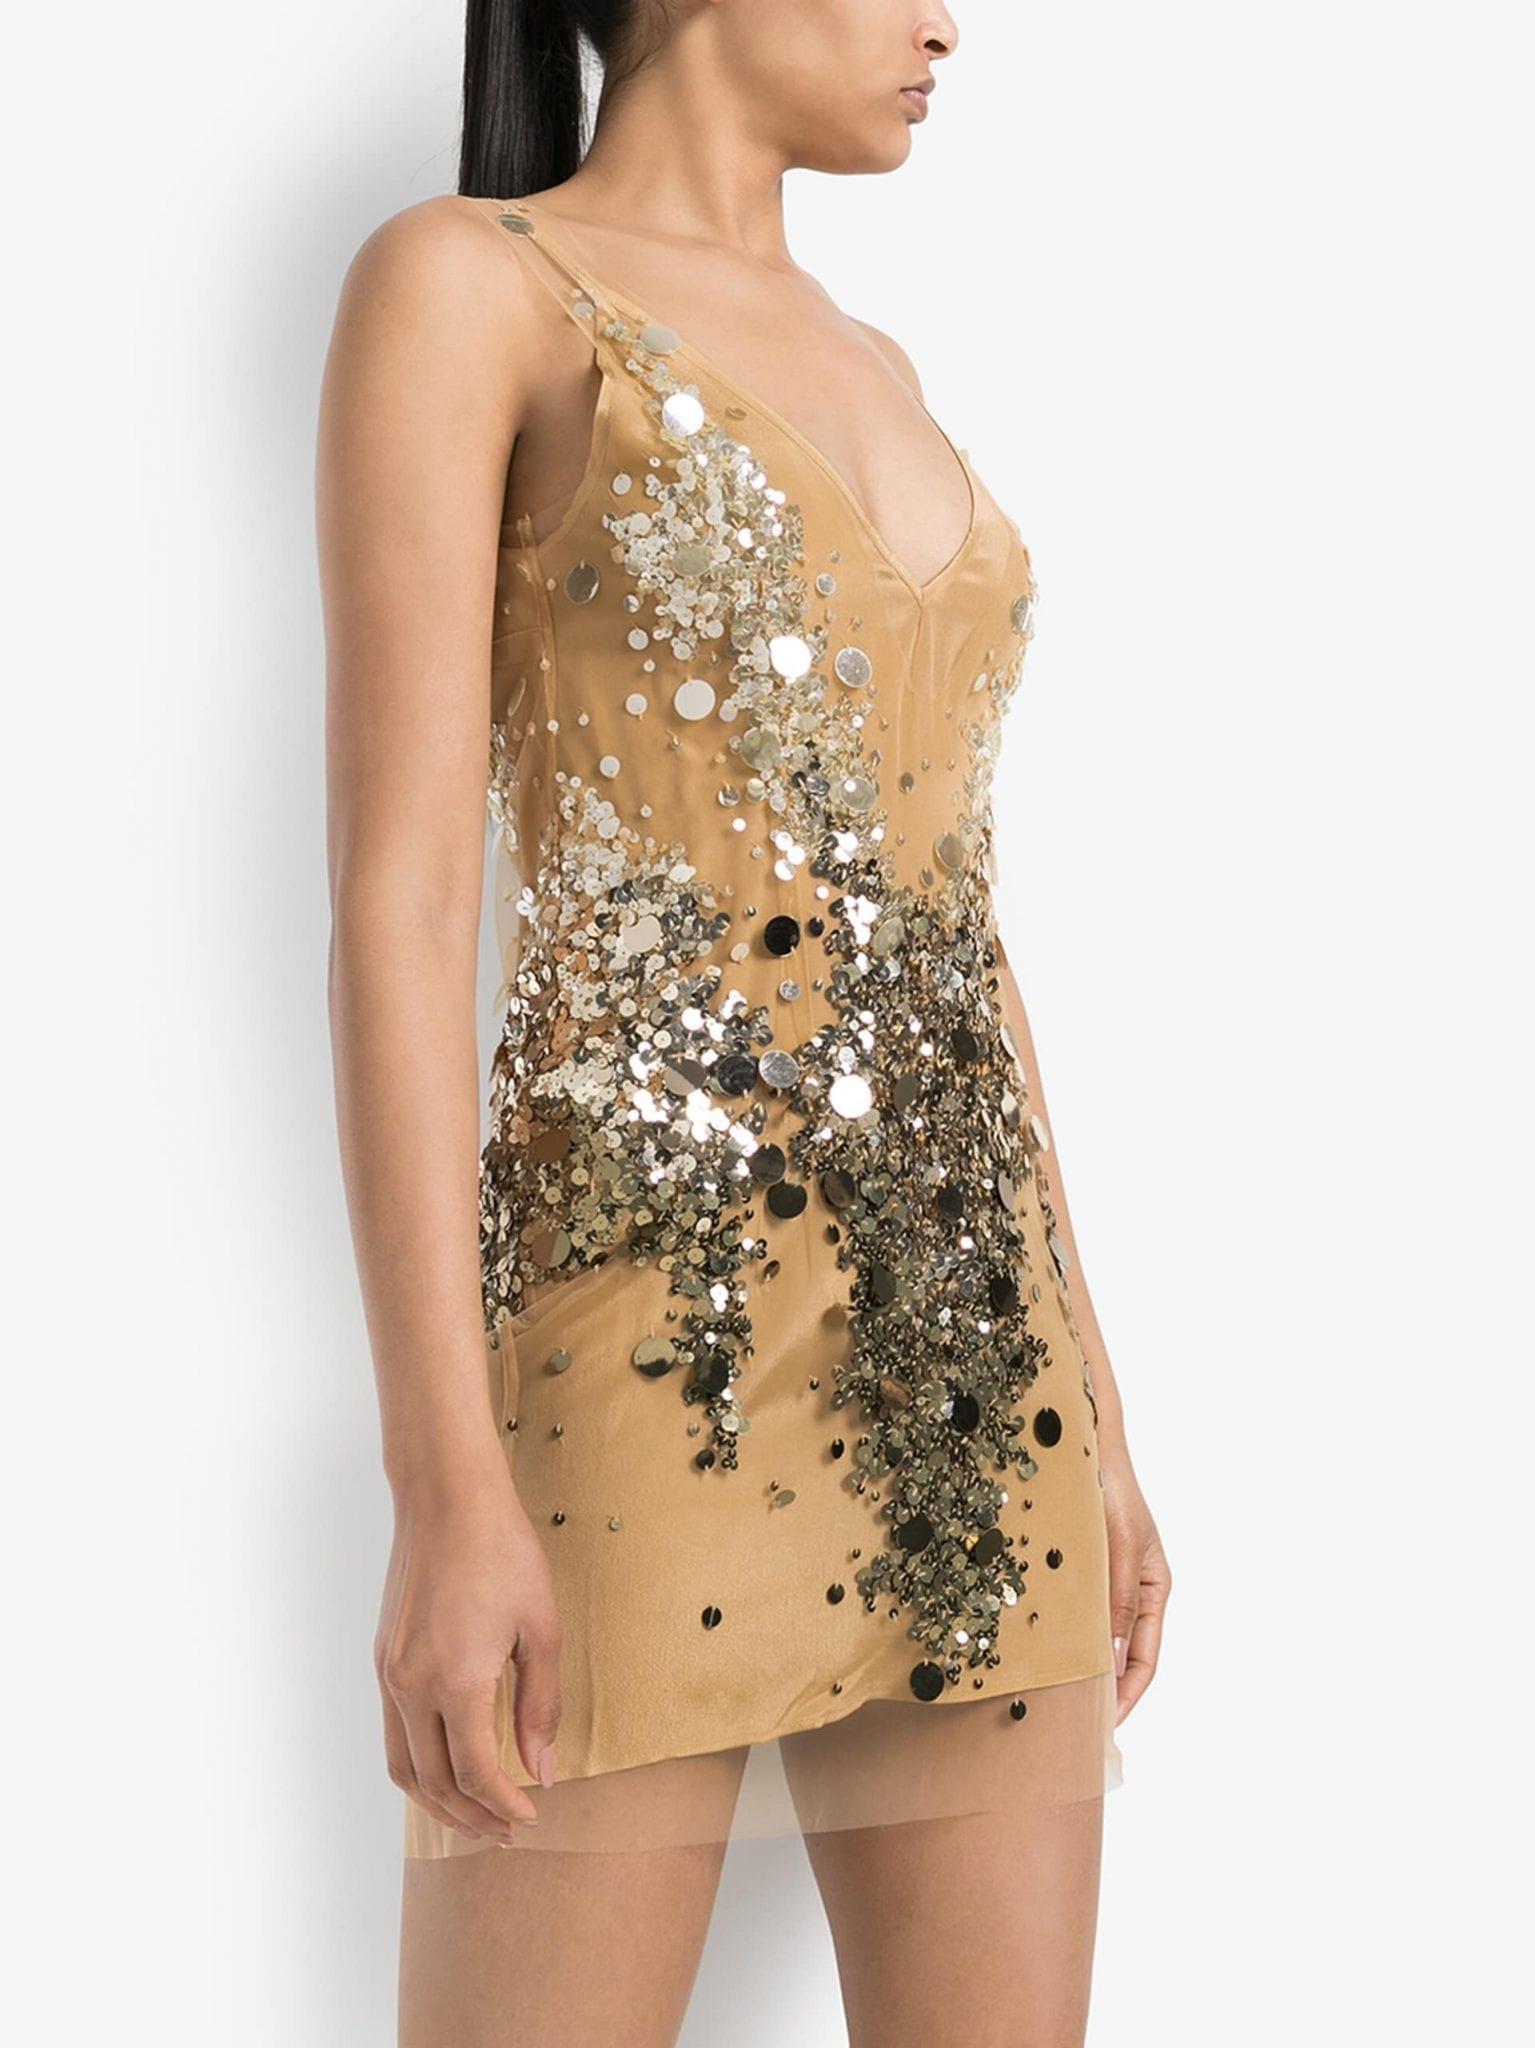 FAITH CONNEXION Sequin Embellished Mesh Mini Dress